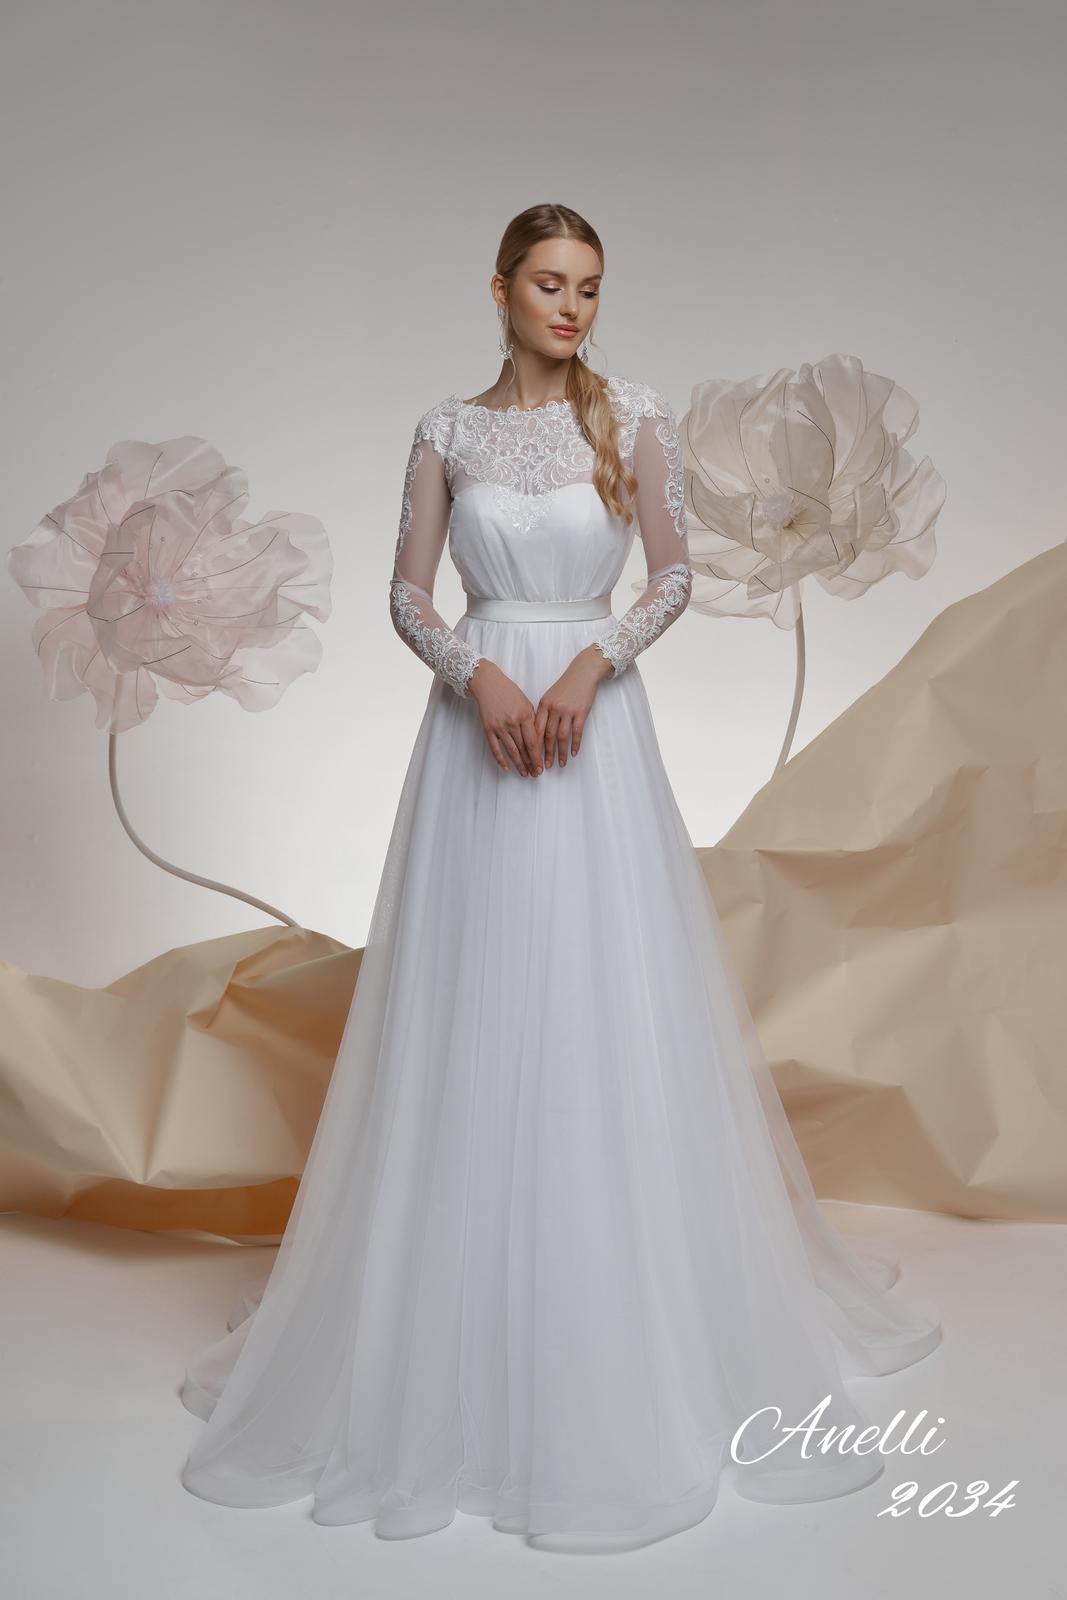 Svadobné šaty - Imagine 2034 - Obrázok č. 1